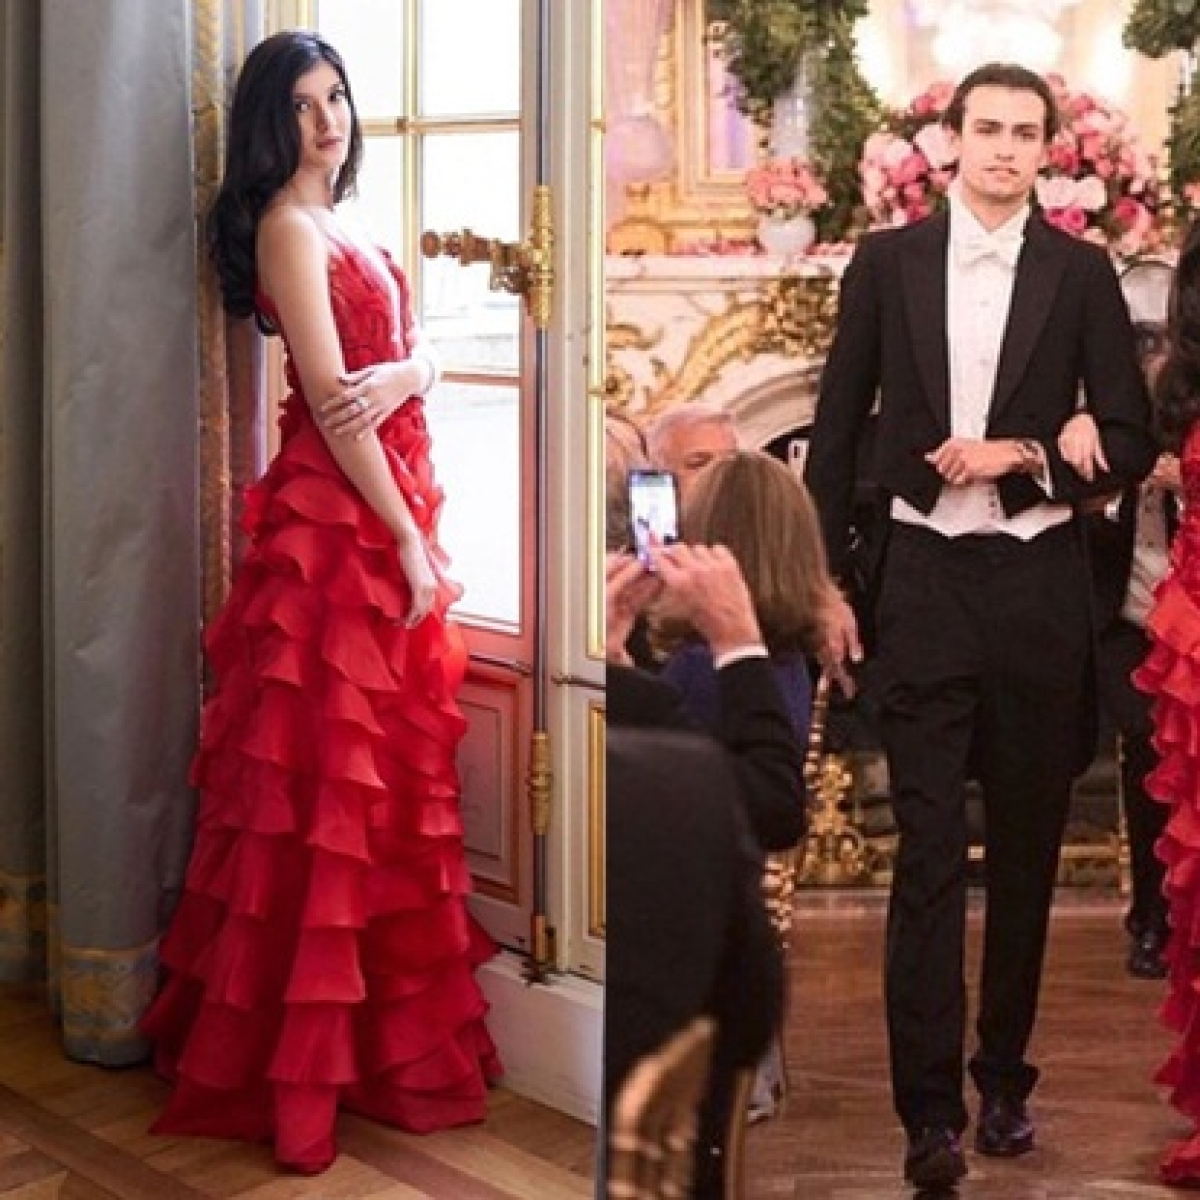 Shanaya Kapoor looks ravishing in red at Le Bal des Débutantes